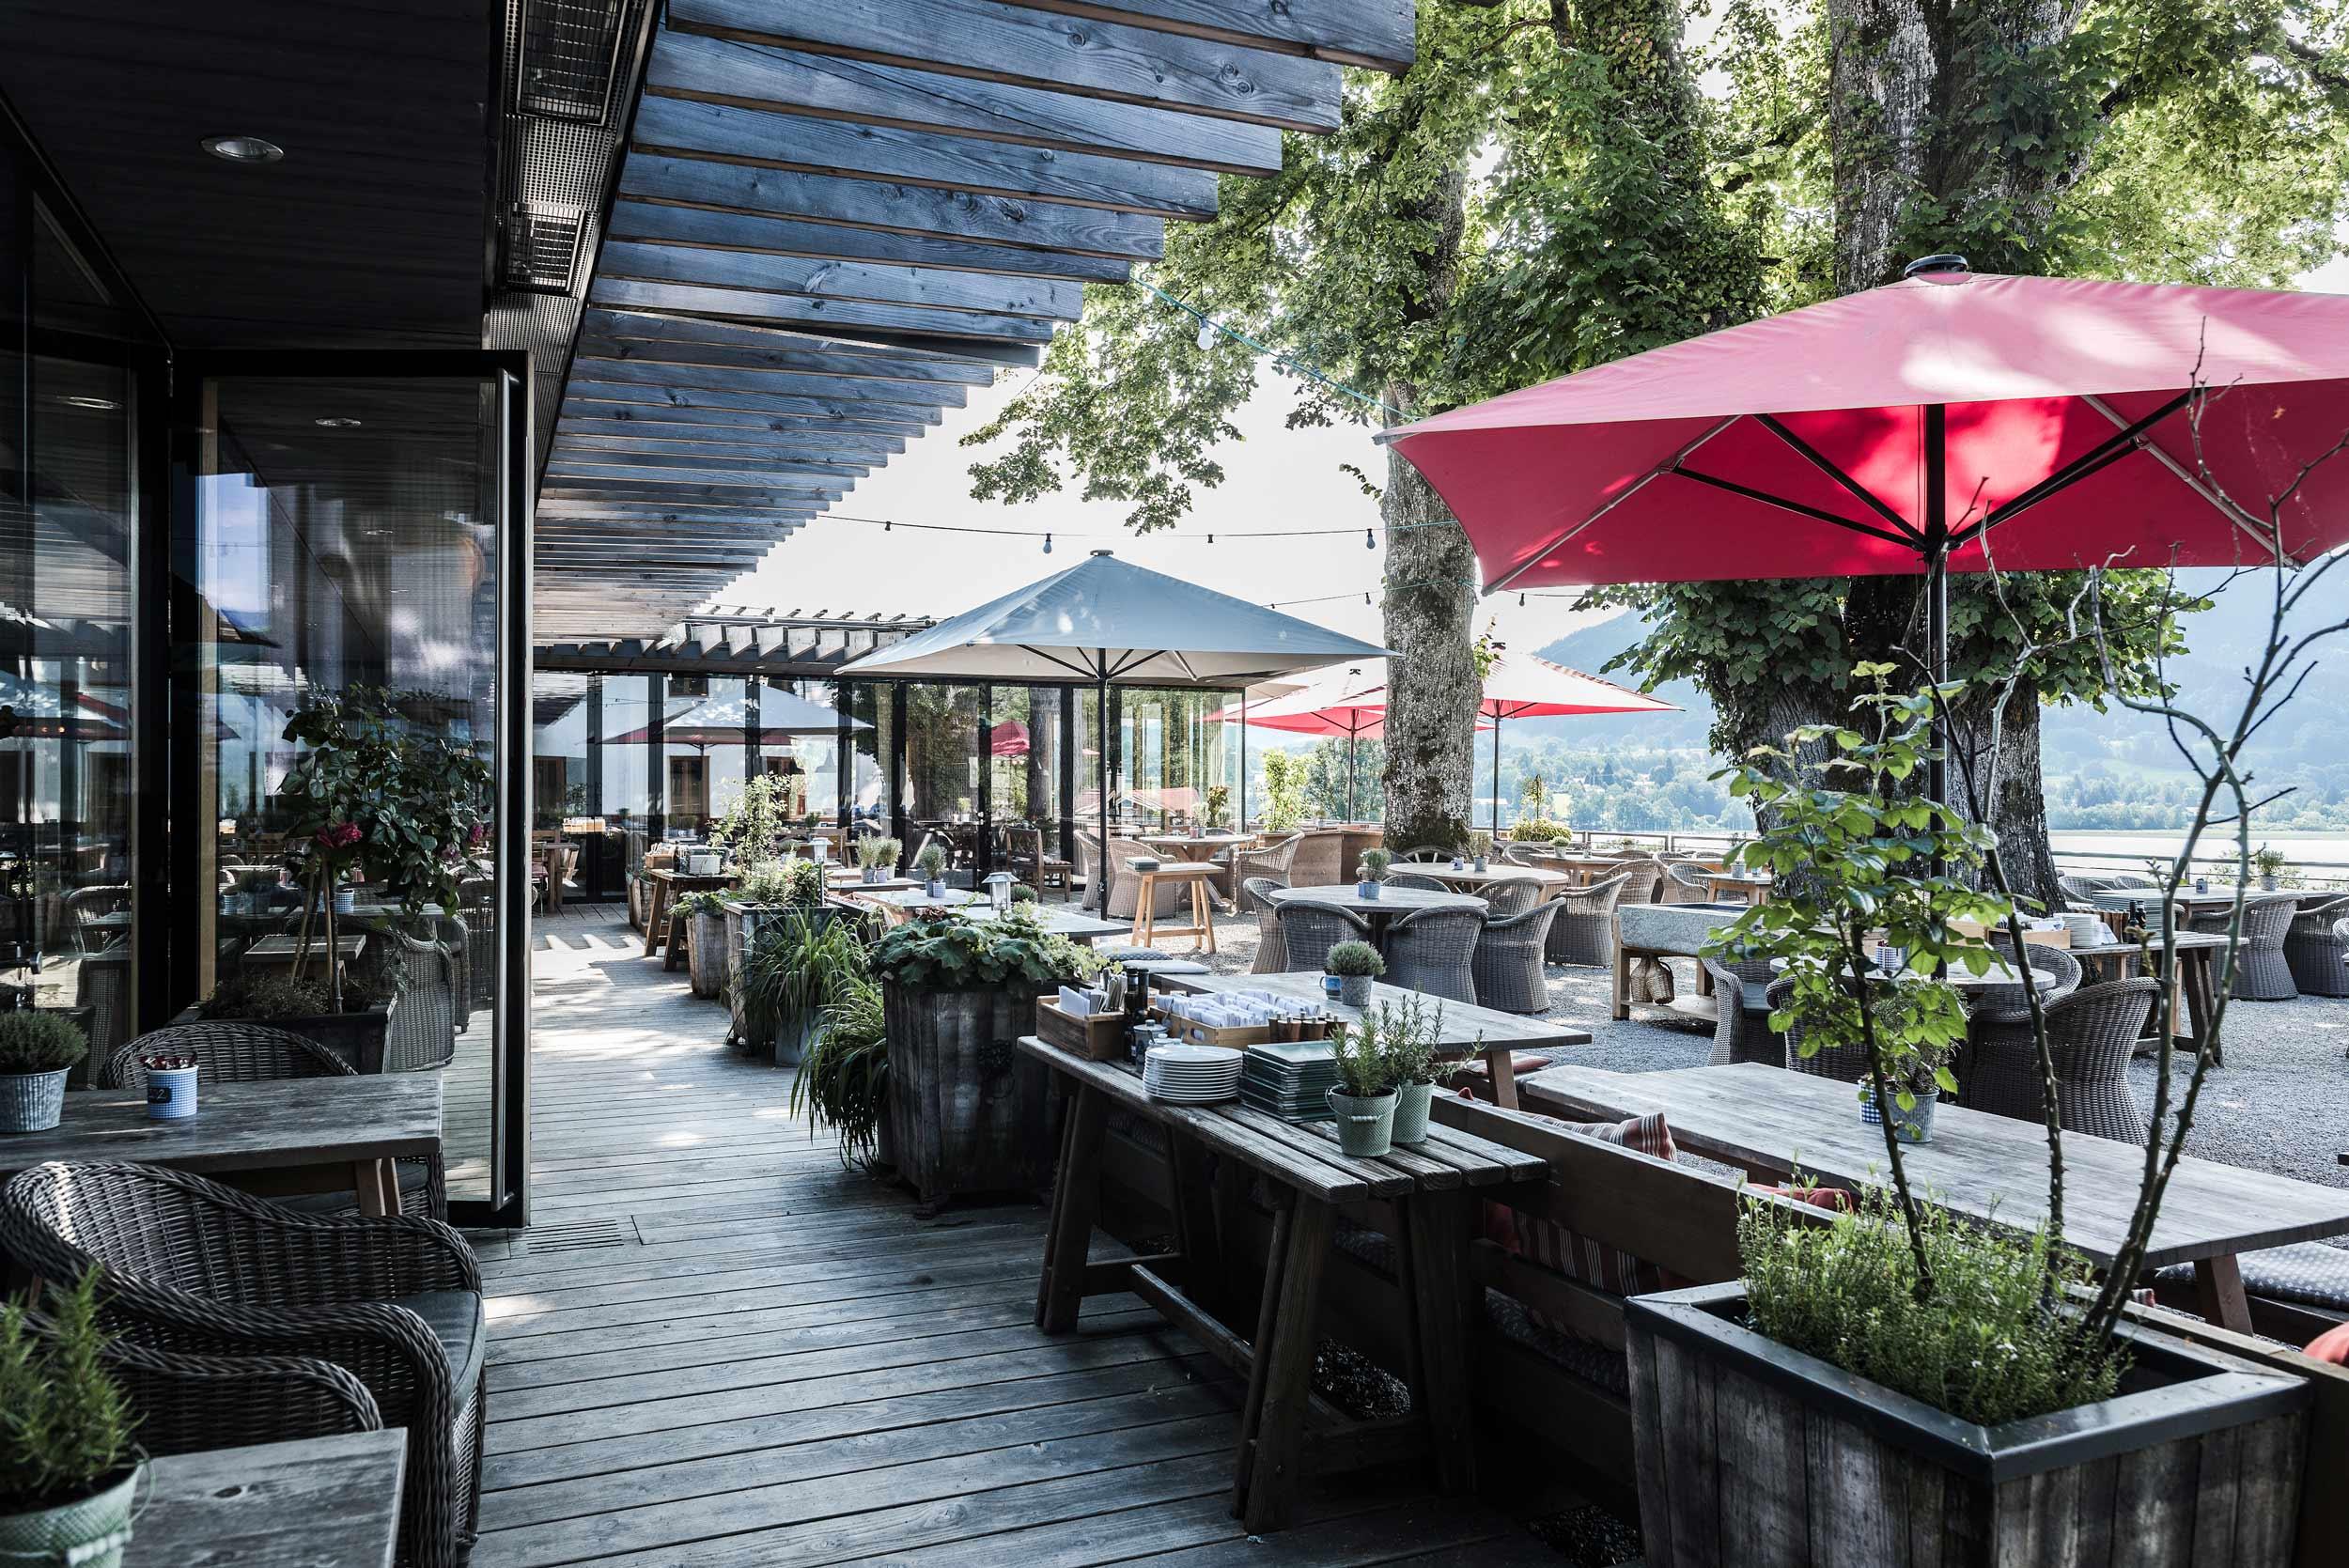 zimmerei-stoib-holzbau-holzhaus-gut-kaltenbrunn-tegernsee-festsaal-restaurant-fassade-sanierung-käfer-biergarten-terrasse-21.jpg